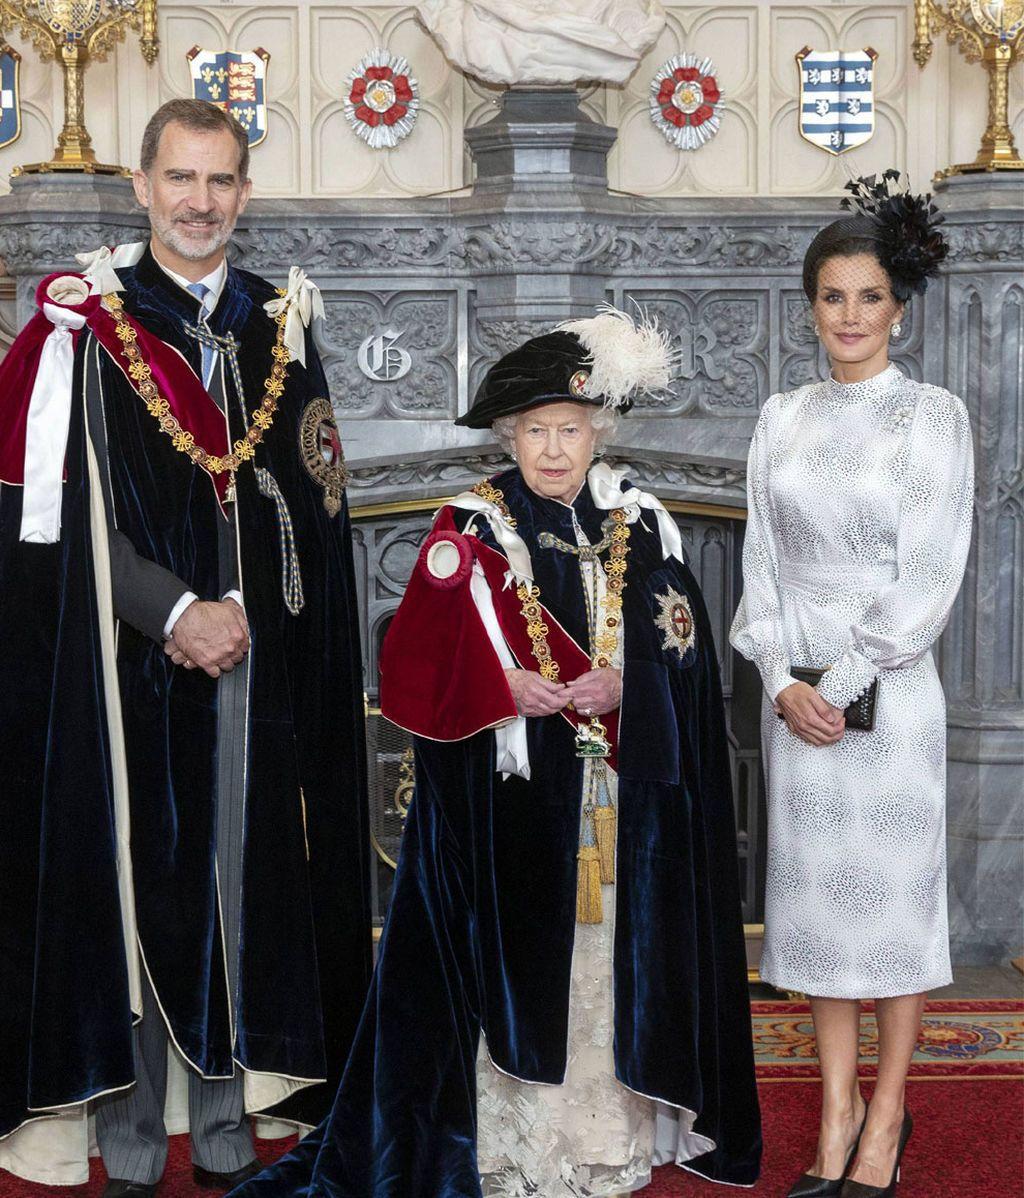 Rey Felipe VI y Reina Letizia con la Reina Isabel II en San Jorge